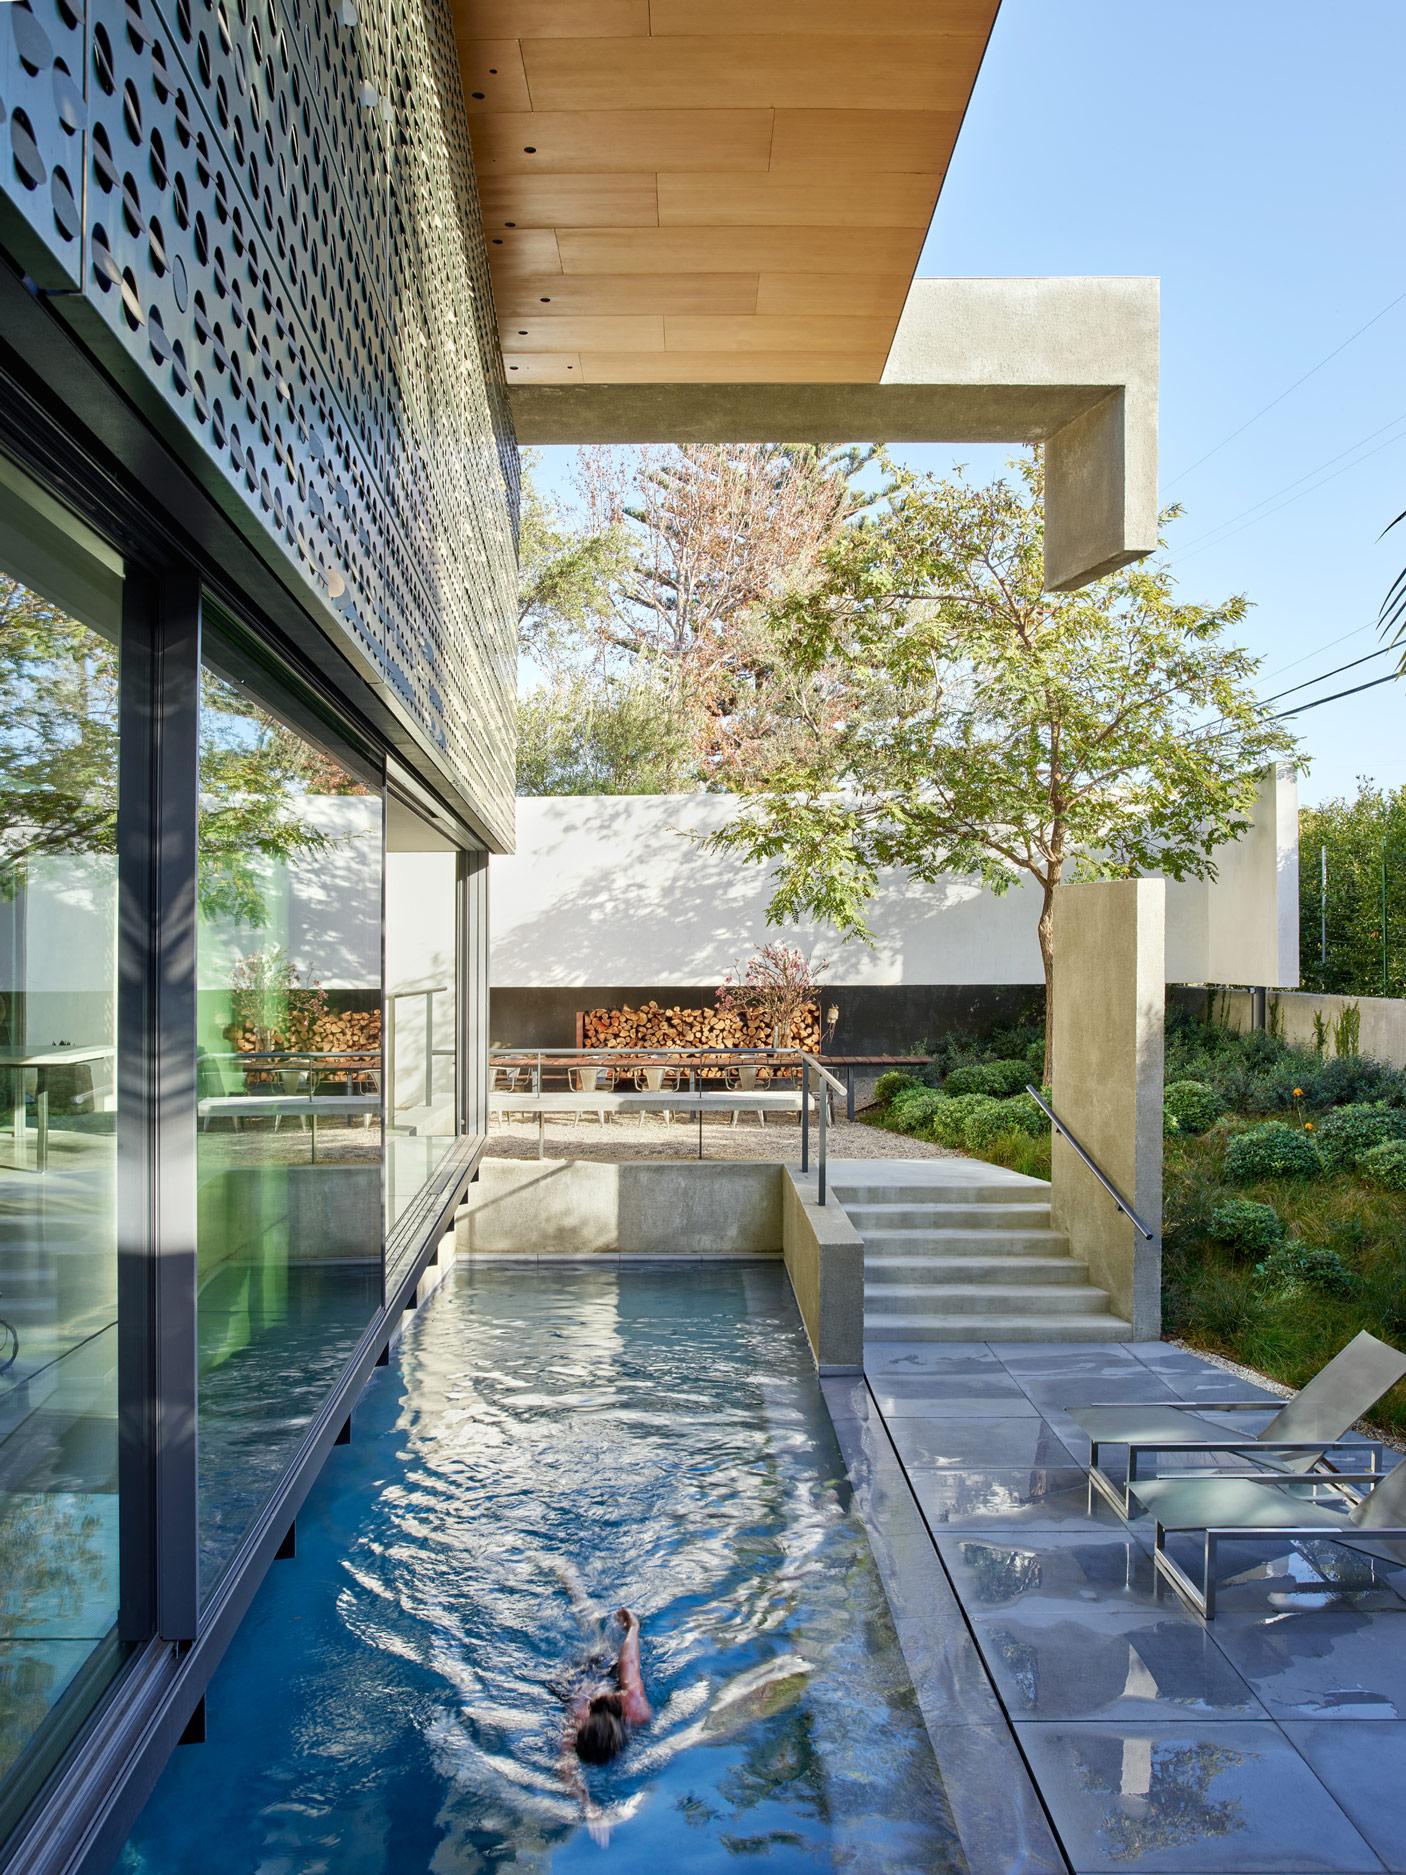 Thomas Mayne Home, Cheviot Hills, California, 2018